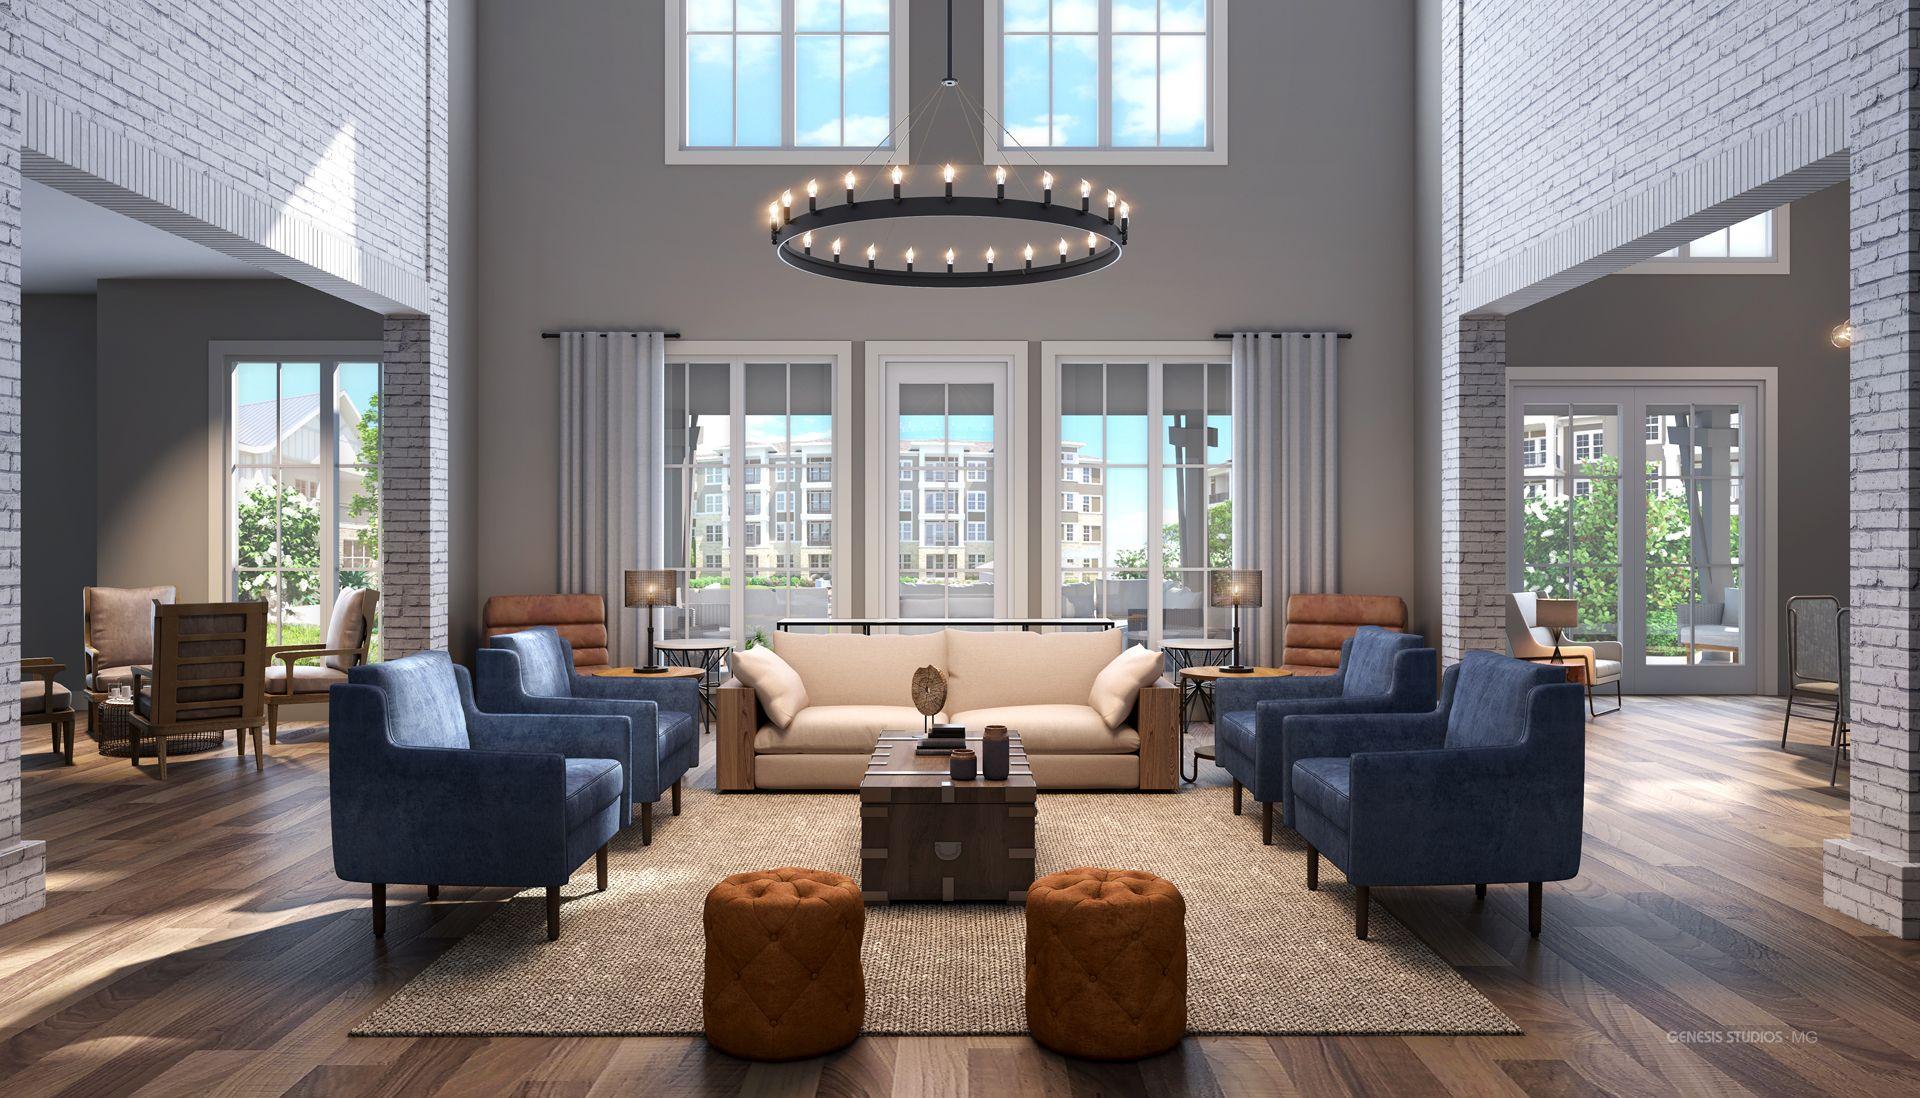 Digital Photorealistic Interior Renderings Interior Rendering